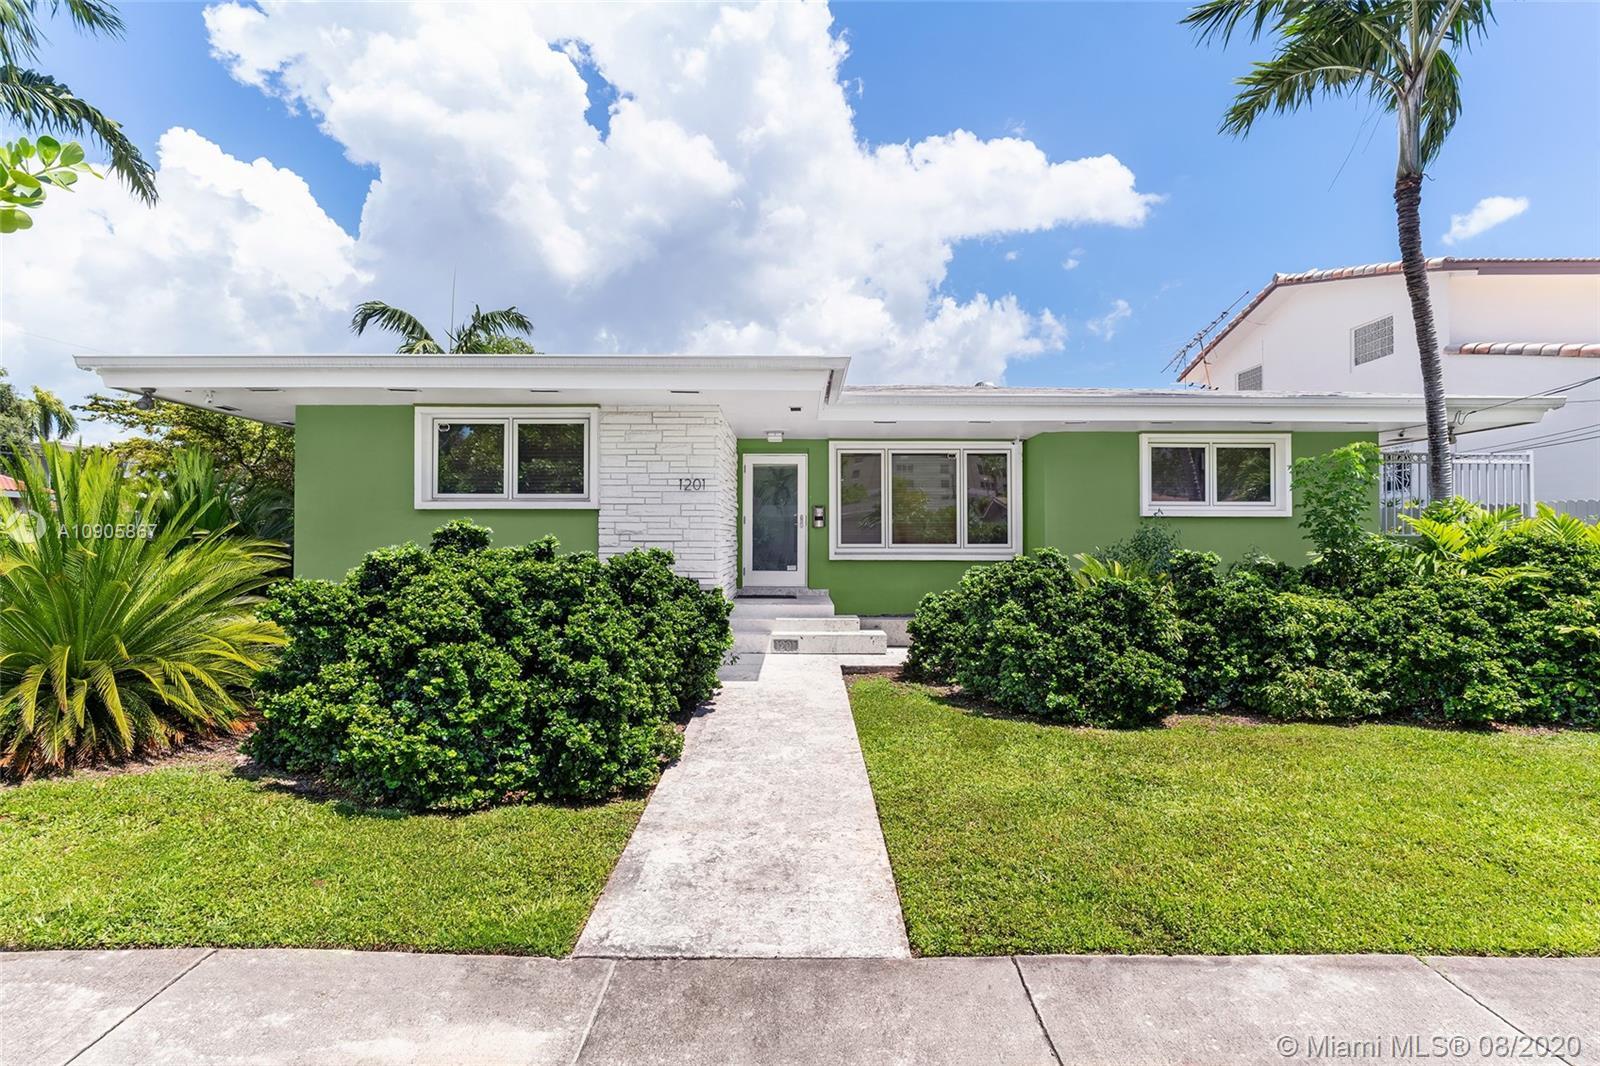 Shore Crest - 1201 NE 81st Ter, Miami, FL 33138